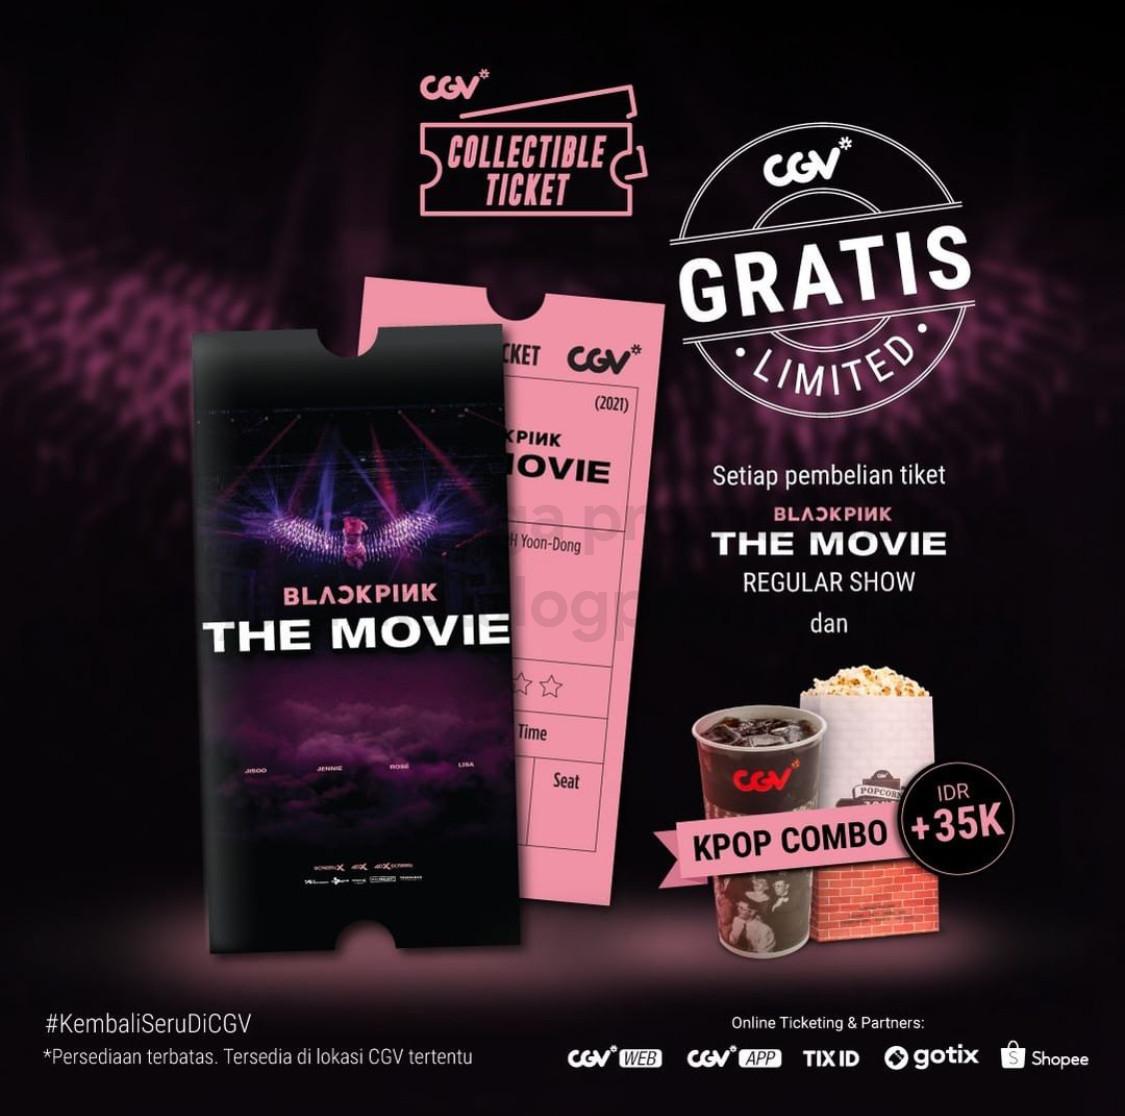 Promo CGV CINEMA GRATIS Collectible Ticket setiap pembelian tiket BLACKPINK The Movie (regular show) dan paket KPOP Combo